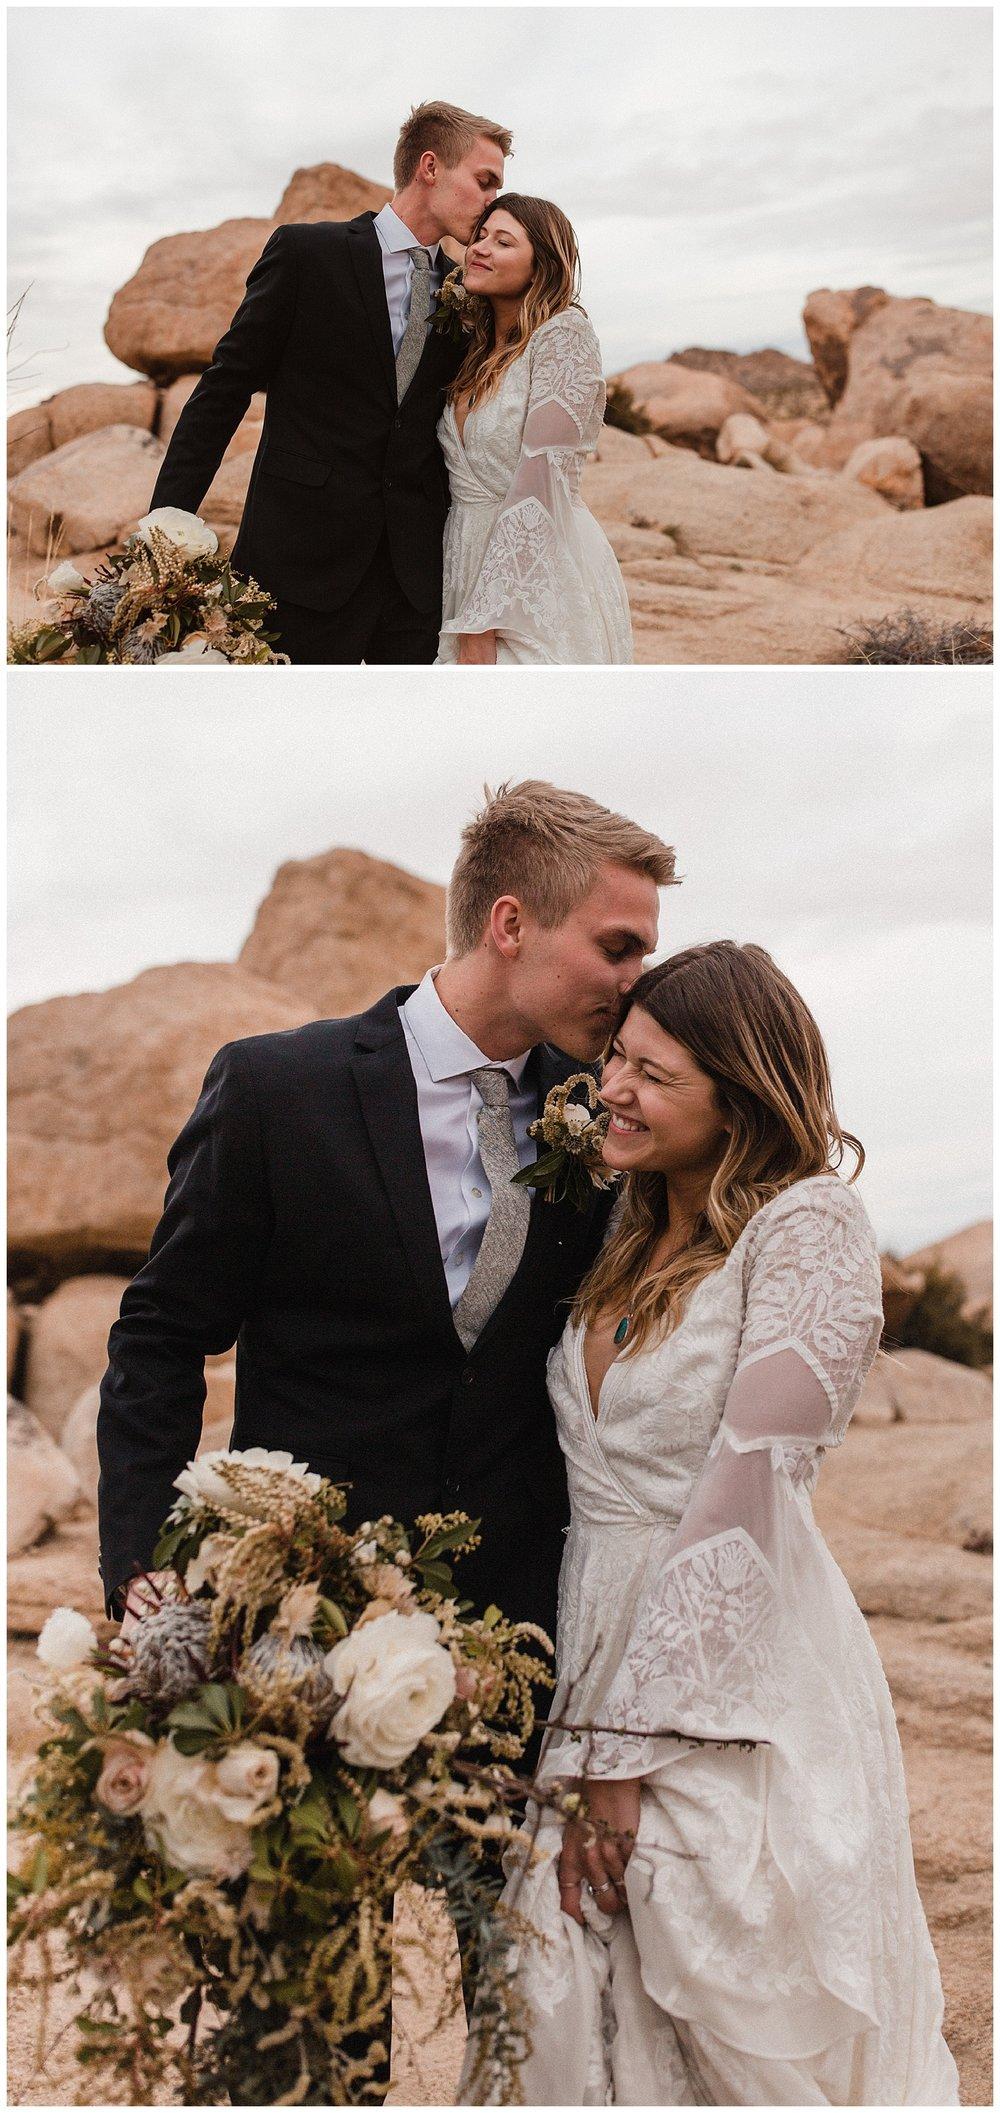 romantic_elopement_joshua_tree_adventurous_wedding_photographer_romantic_intimate_wedding_0016.jpg